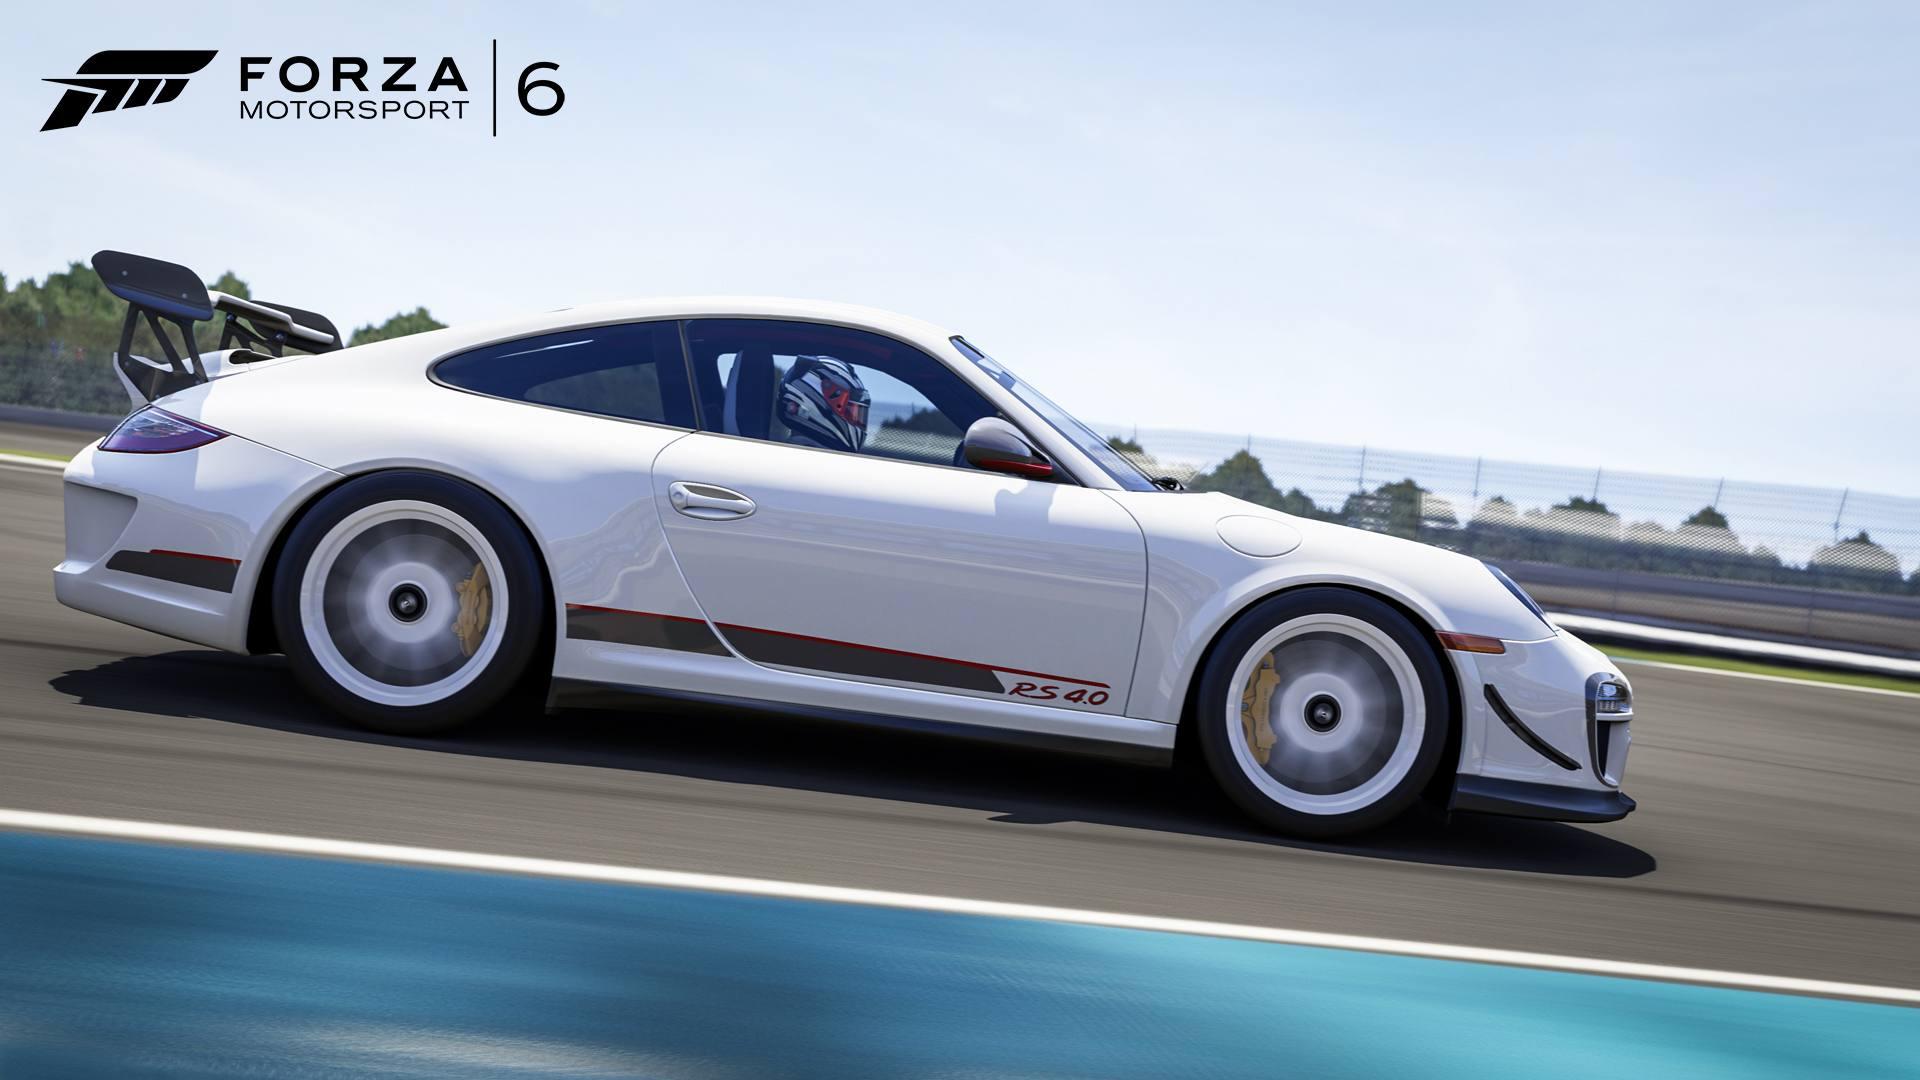 Forza Motorsport 6 01-03-16 2012 Porsche 911 GT3 RS 4.0 (997)